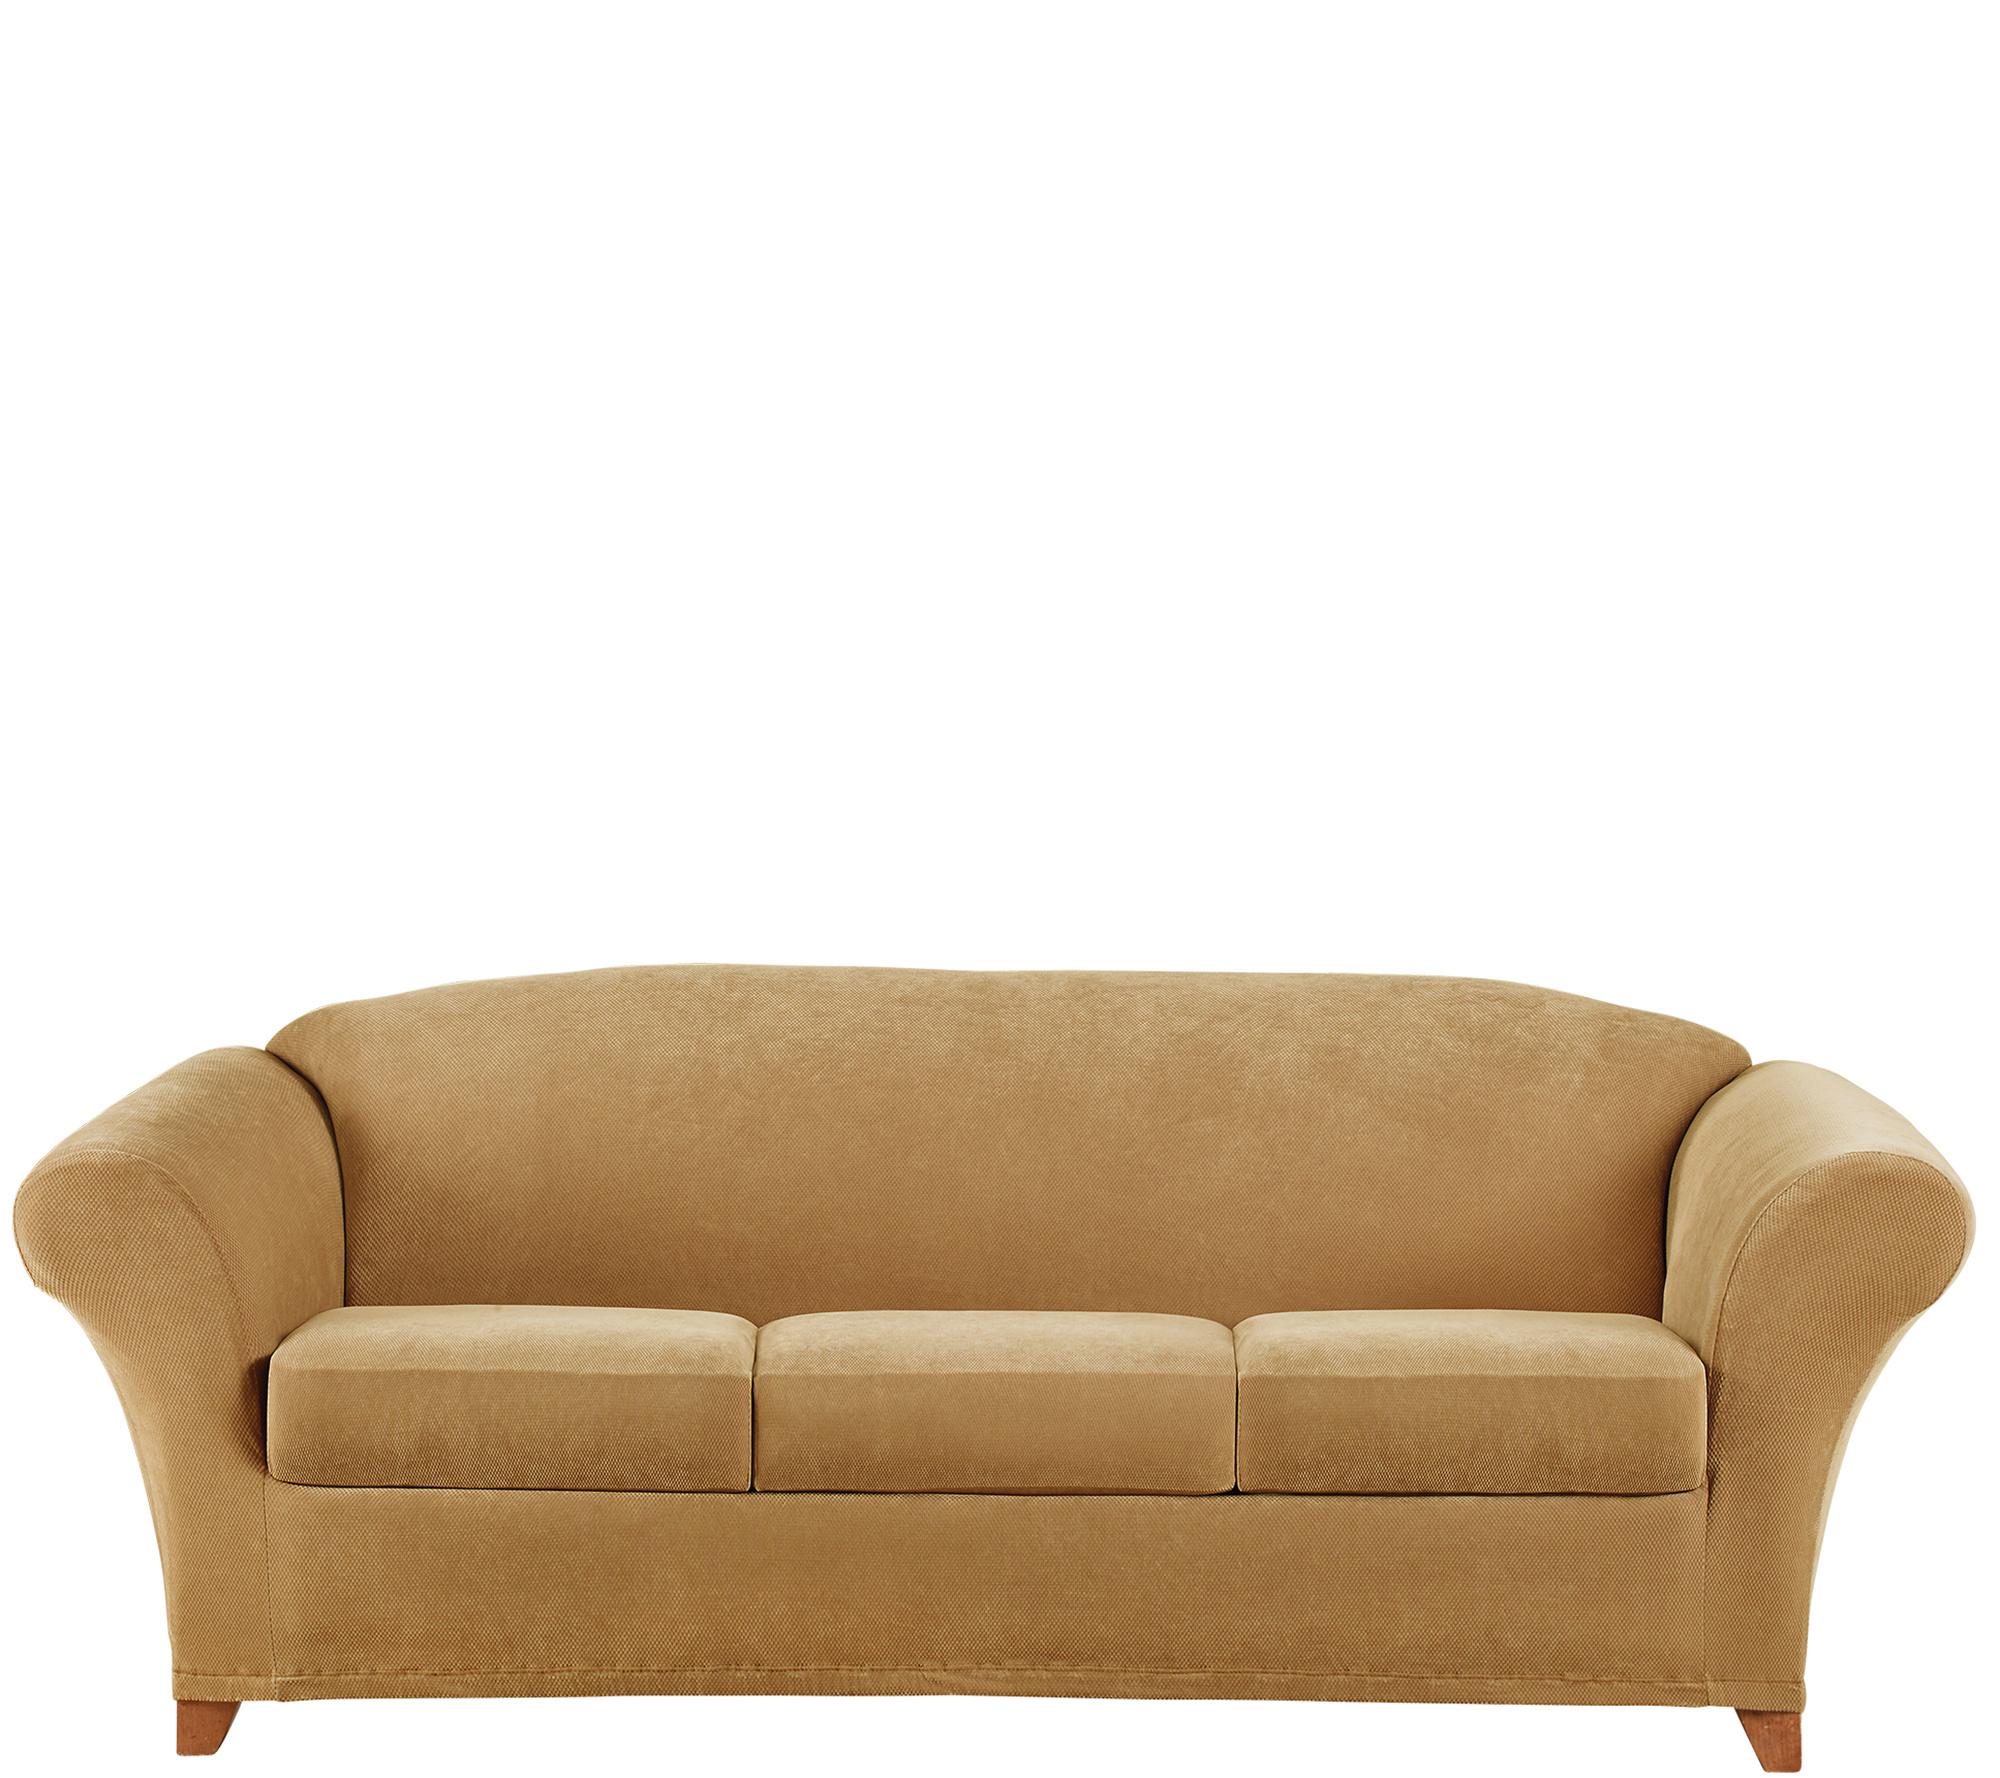 Sure Fit Stretch Pique 3 Seat Sofa Slipcover Qvc Com